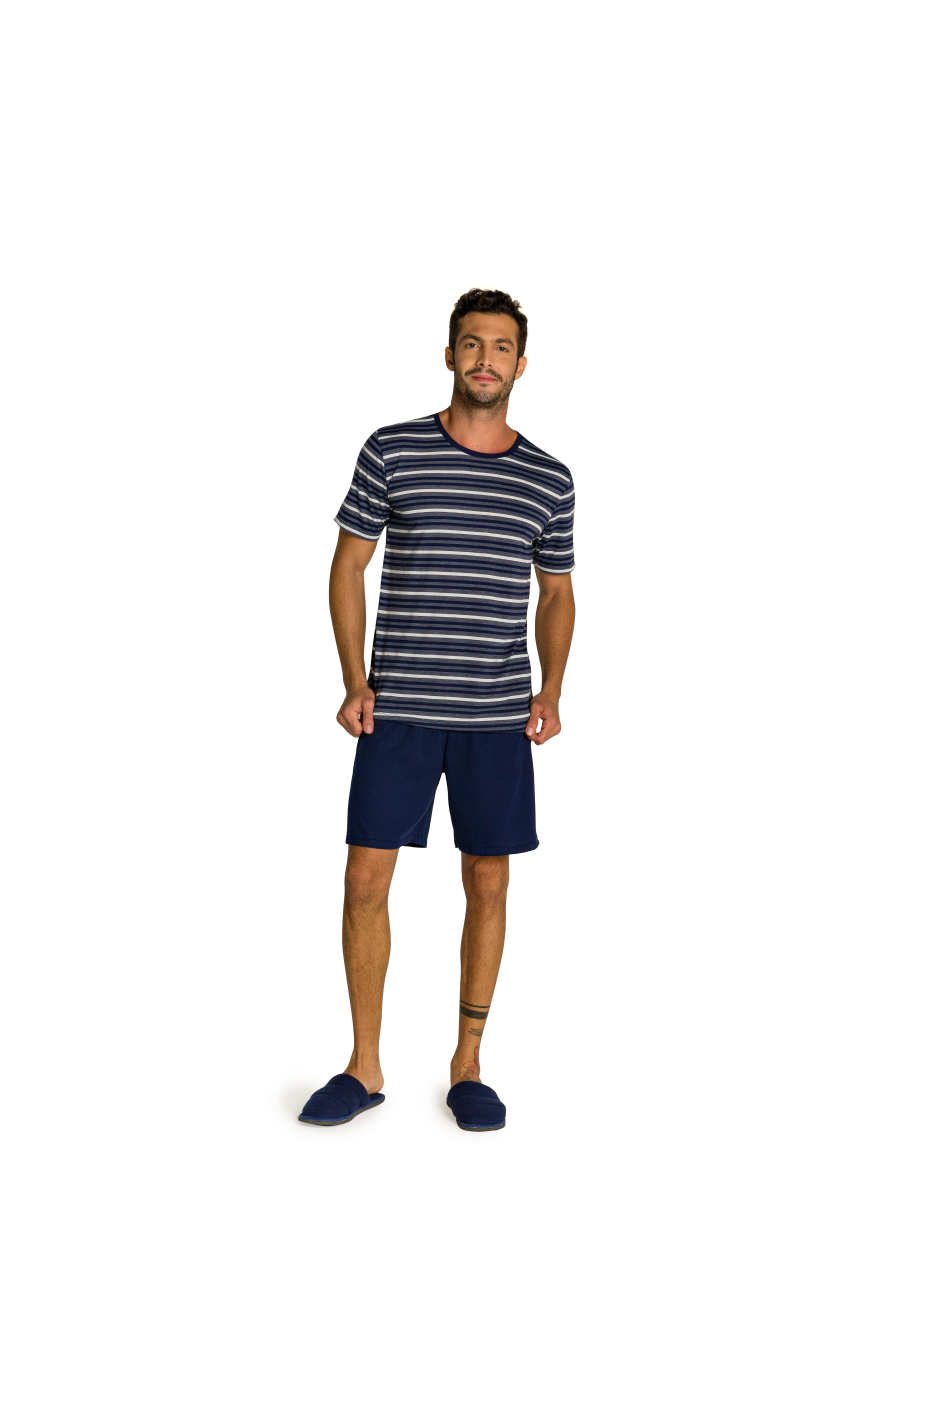 212/C - Pijama Adulto Masculino Listras